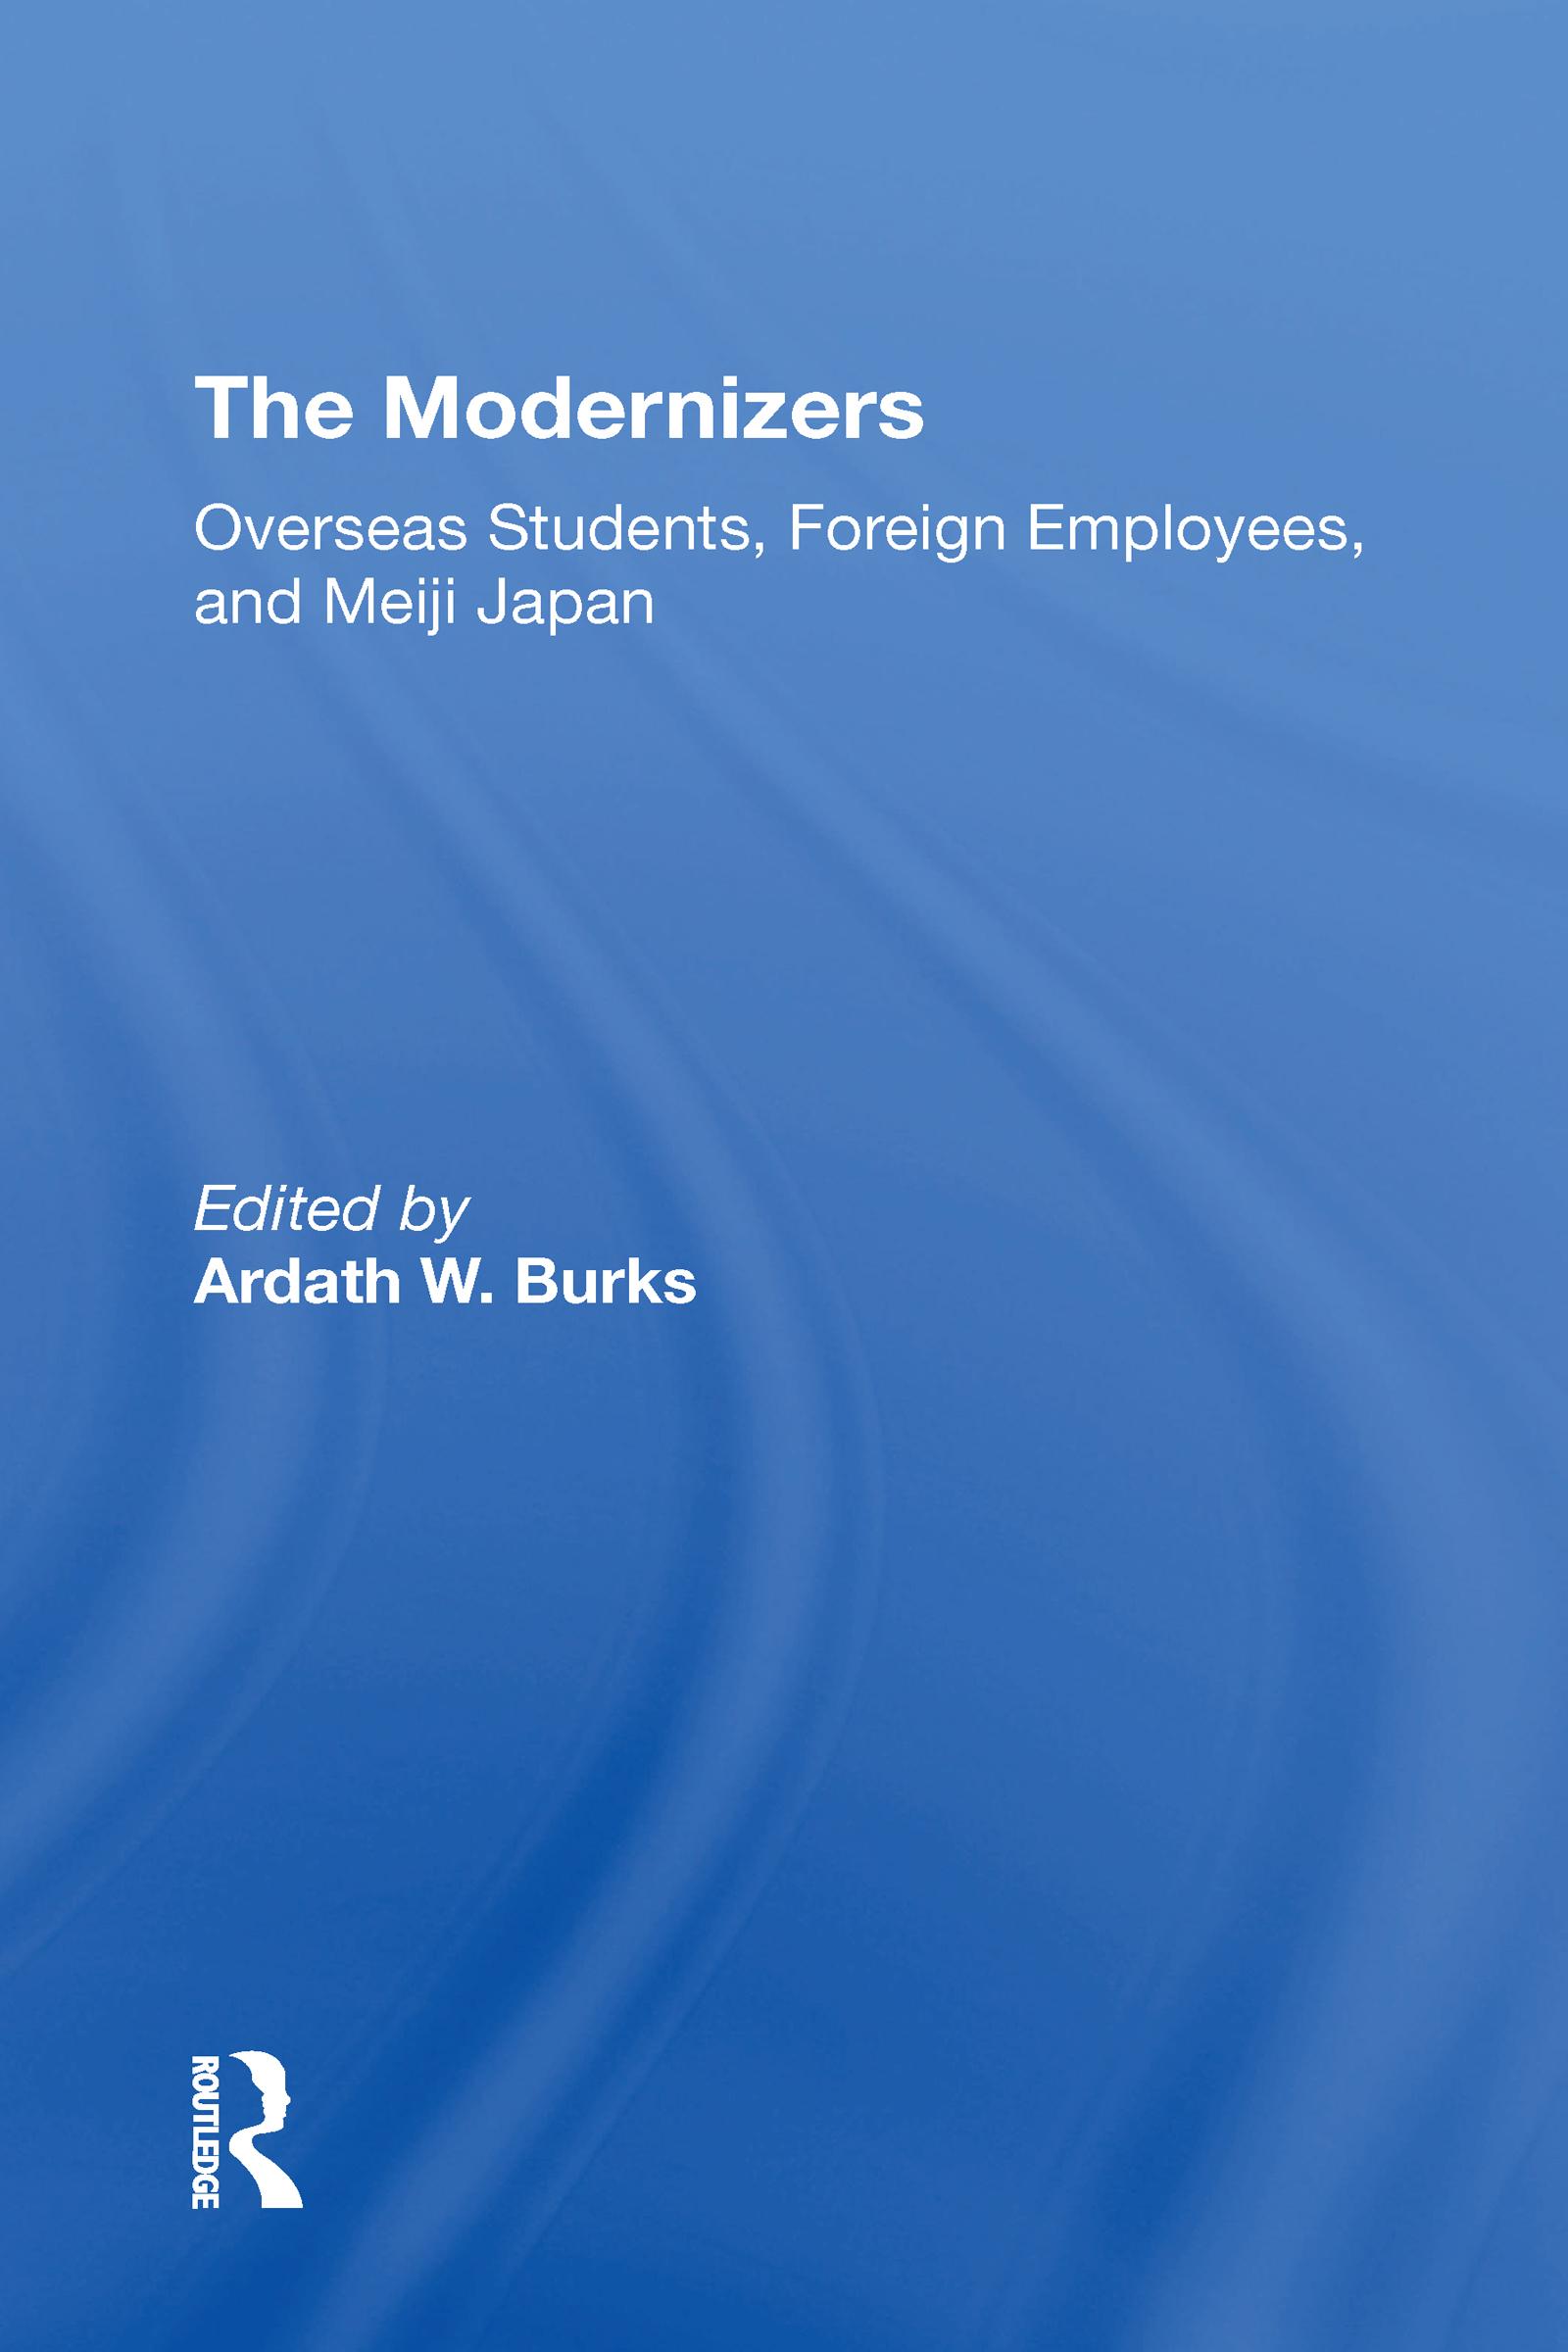 The Modernizers